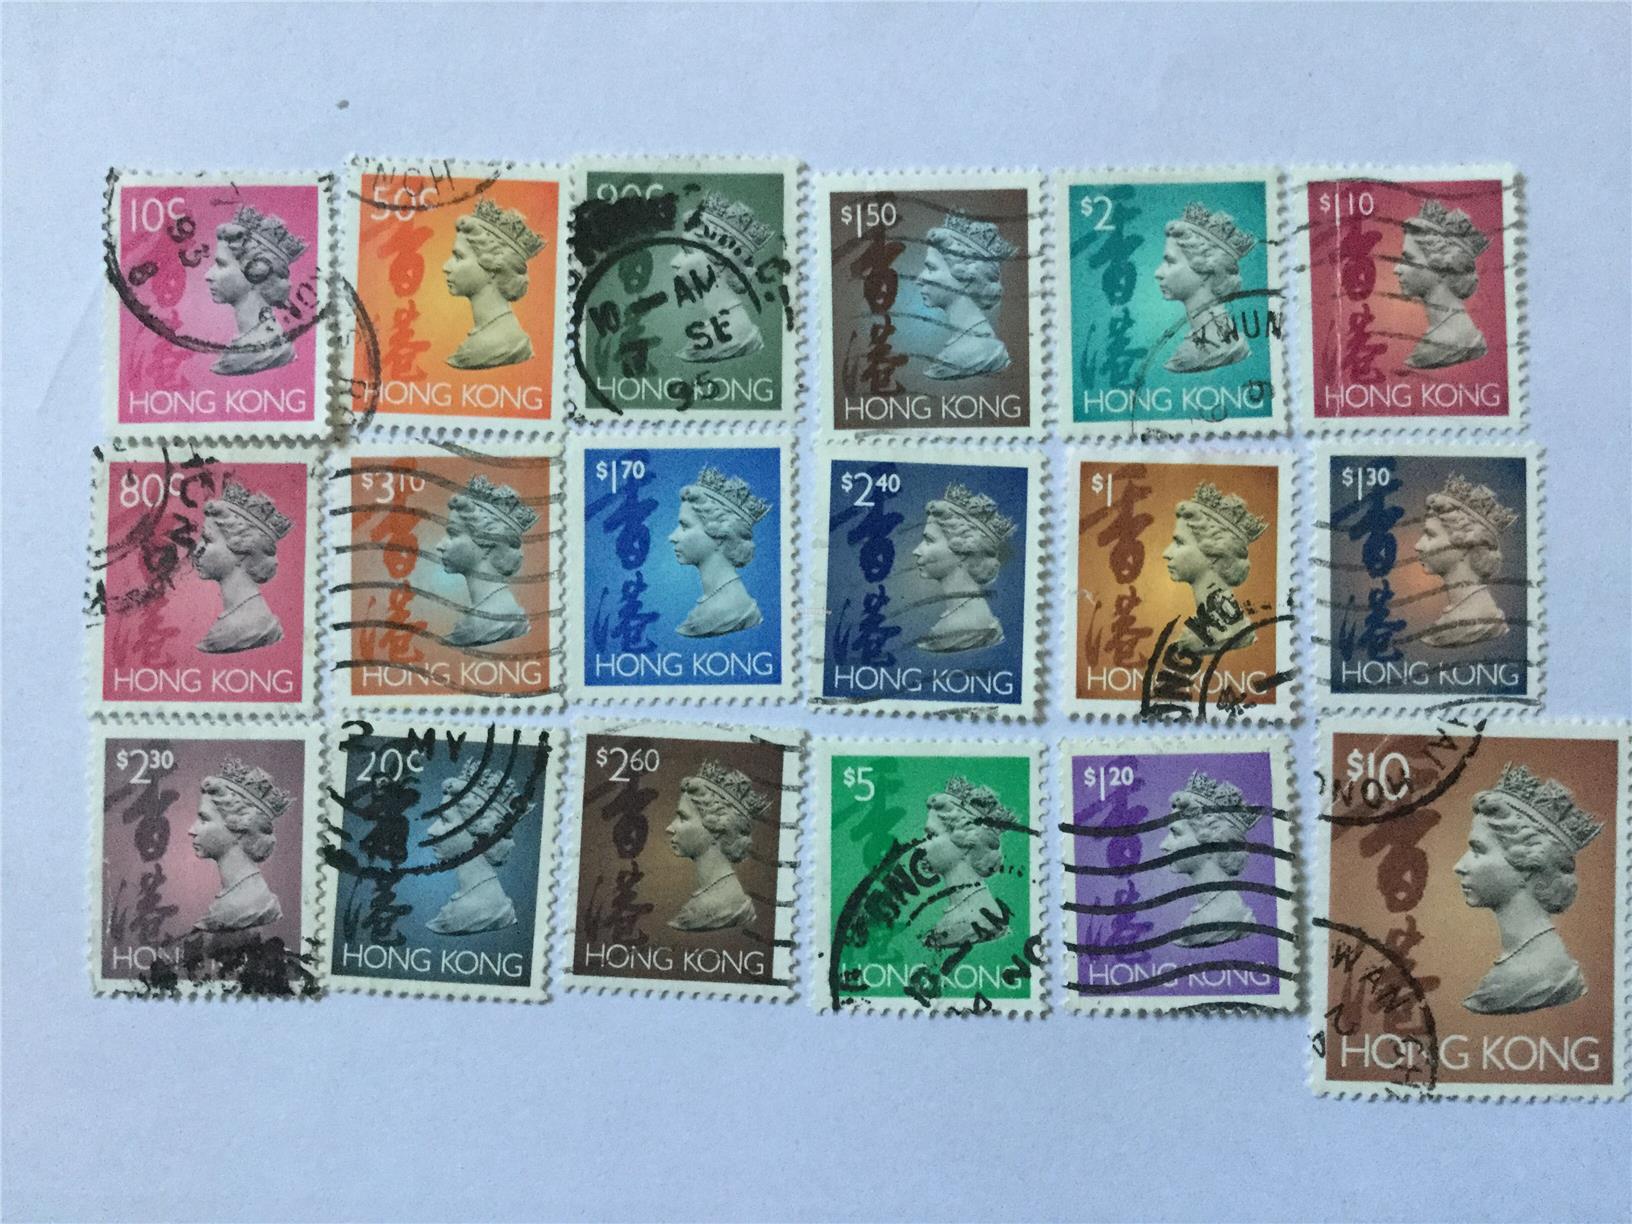 Hong Kong Nice Stamps Lot 6